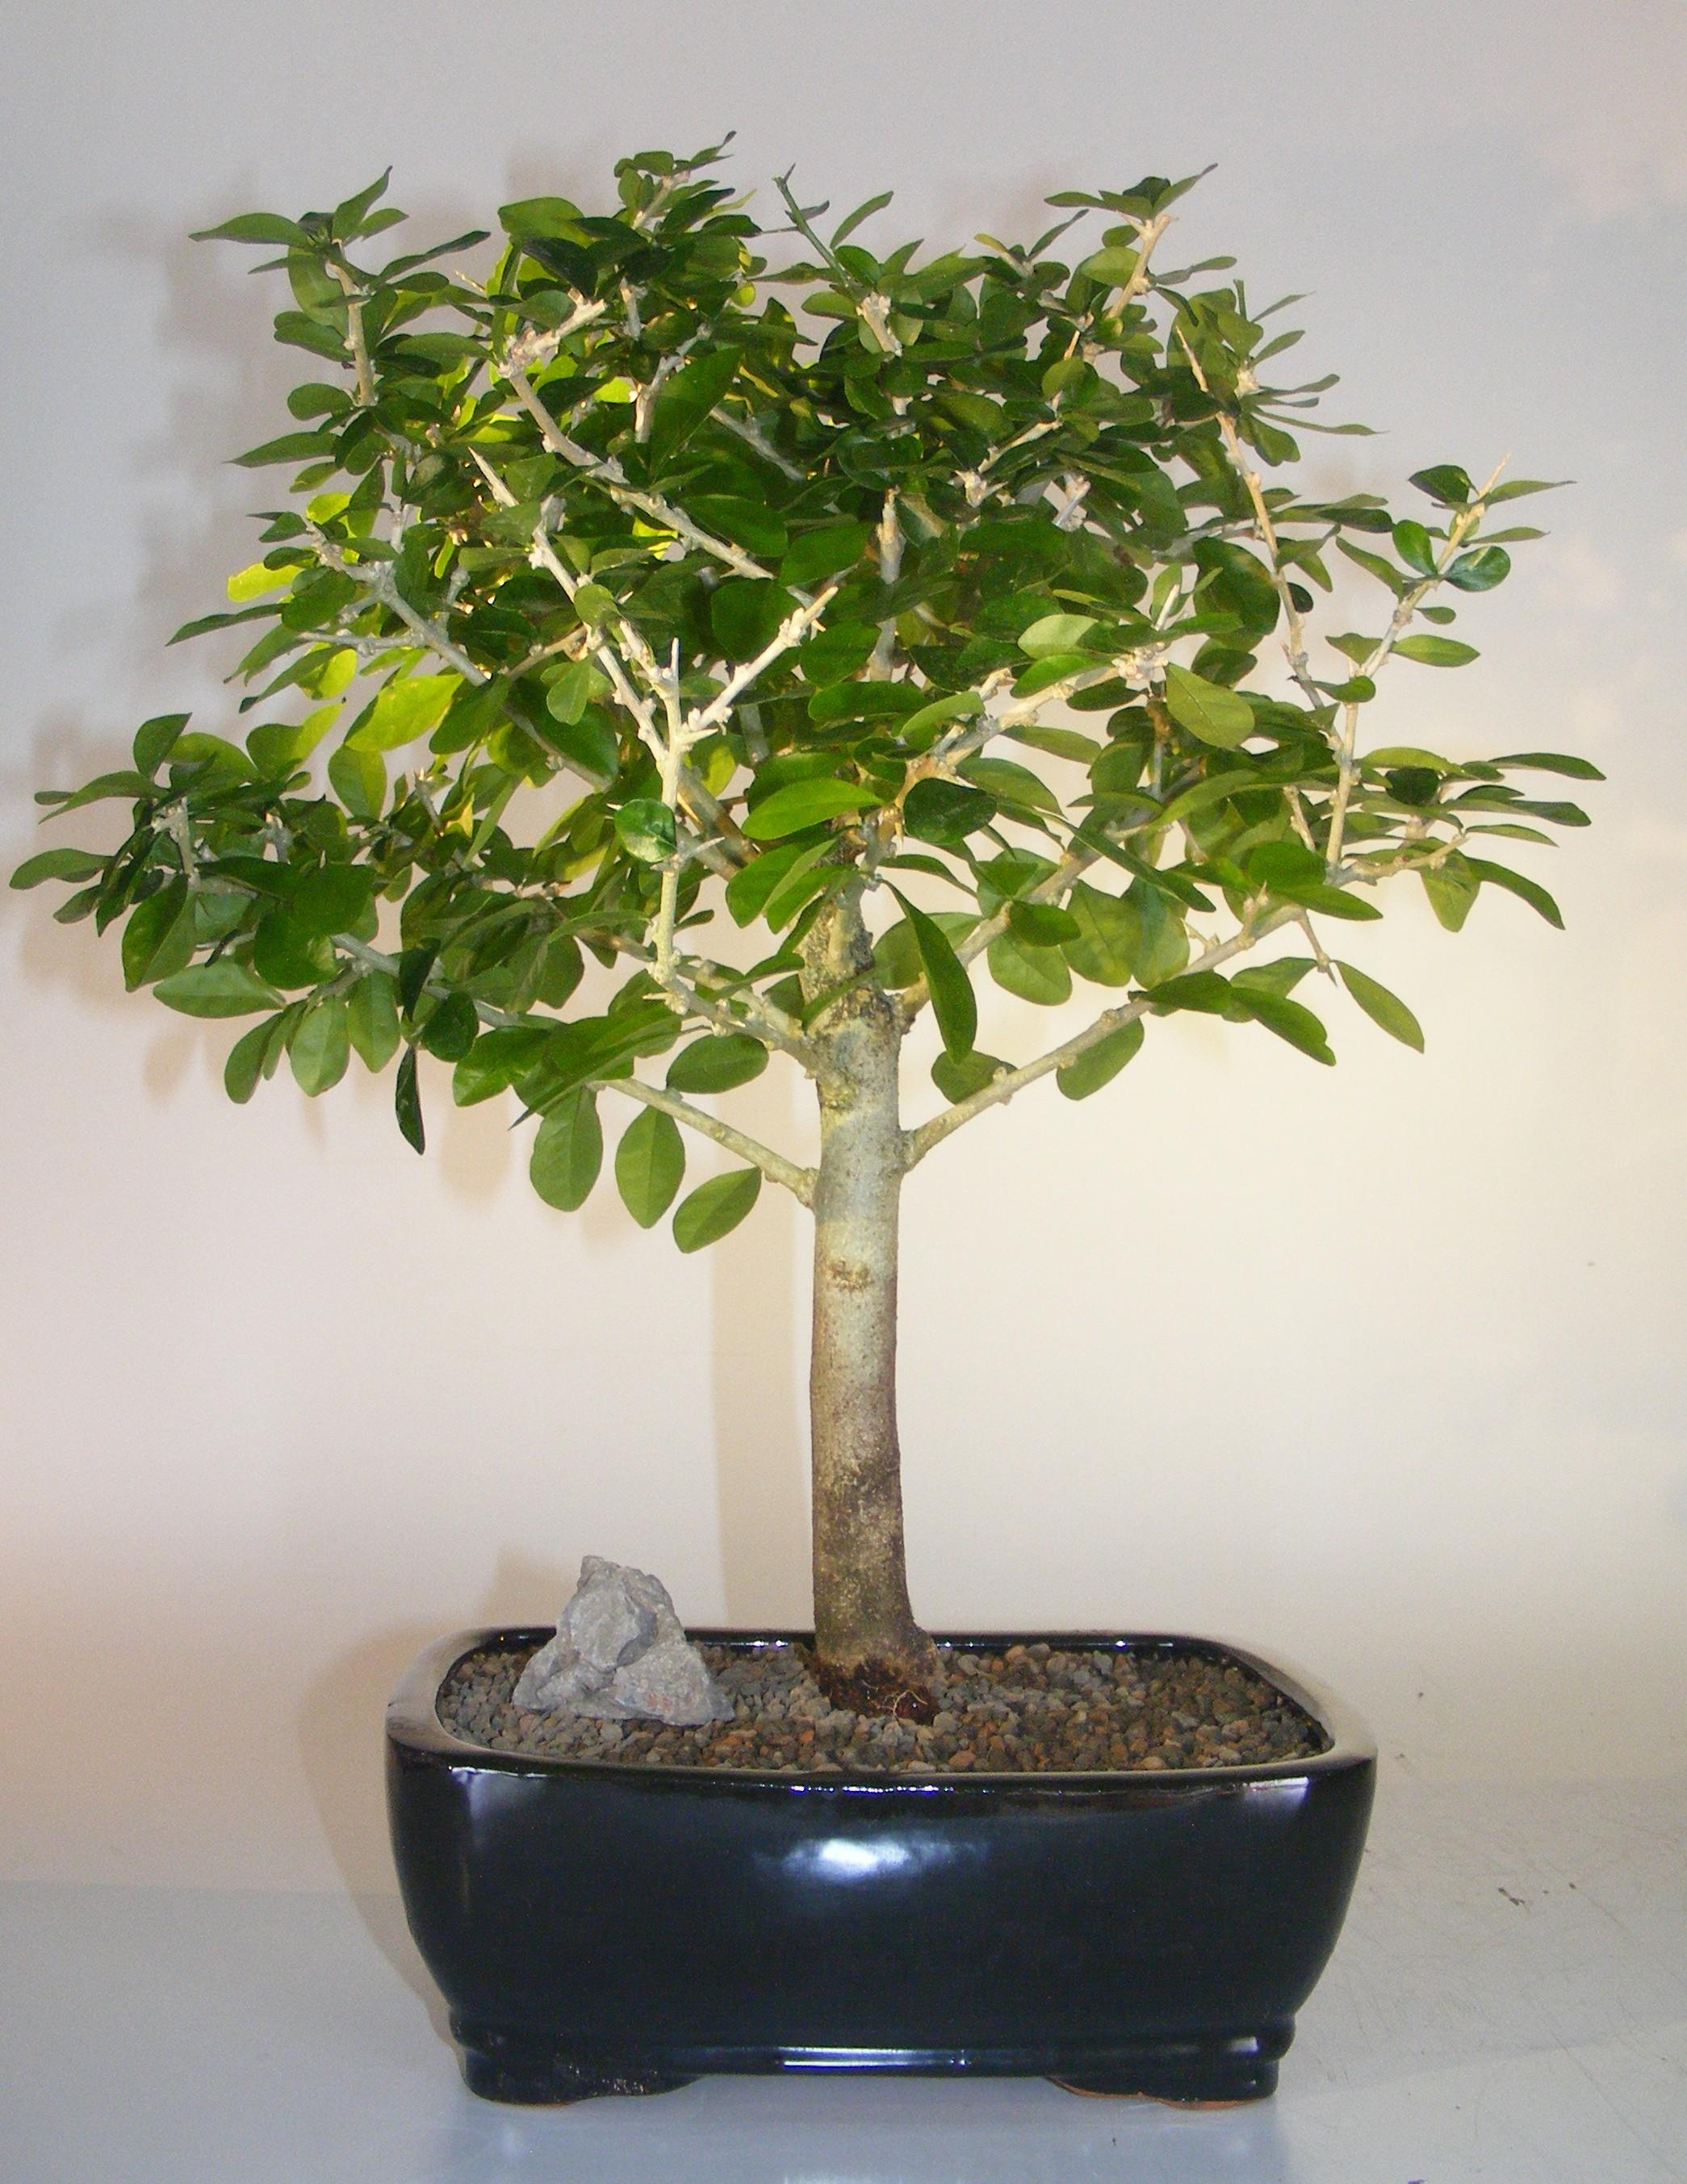 Flowering & Fruiting Tintillo Bonsai Tree (Randia aculeata) Image